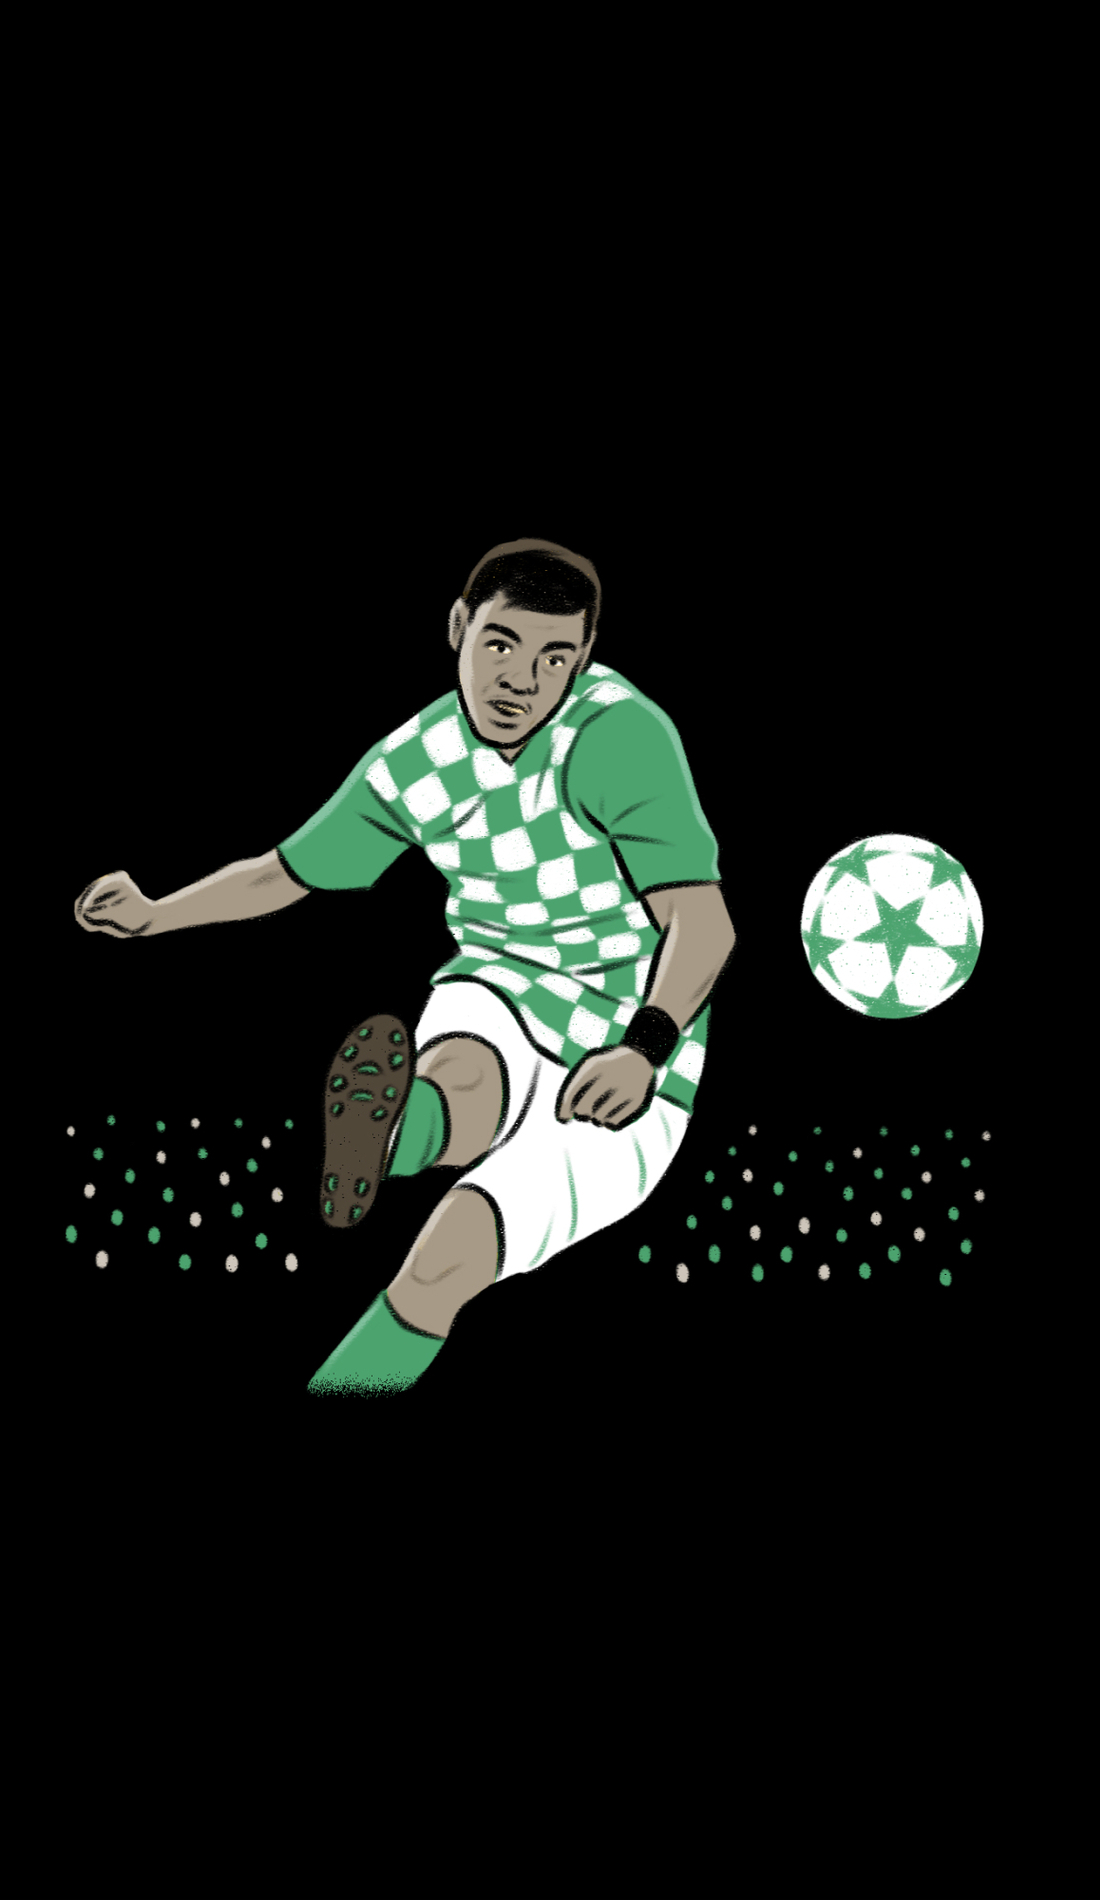 A Leagues Cup live event